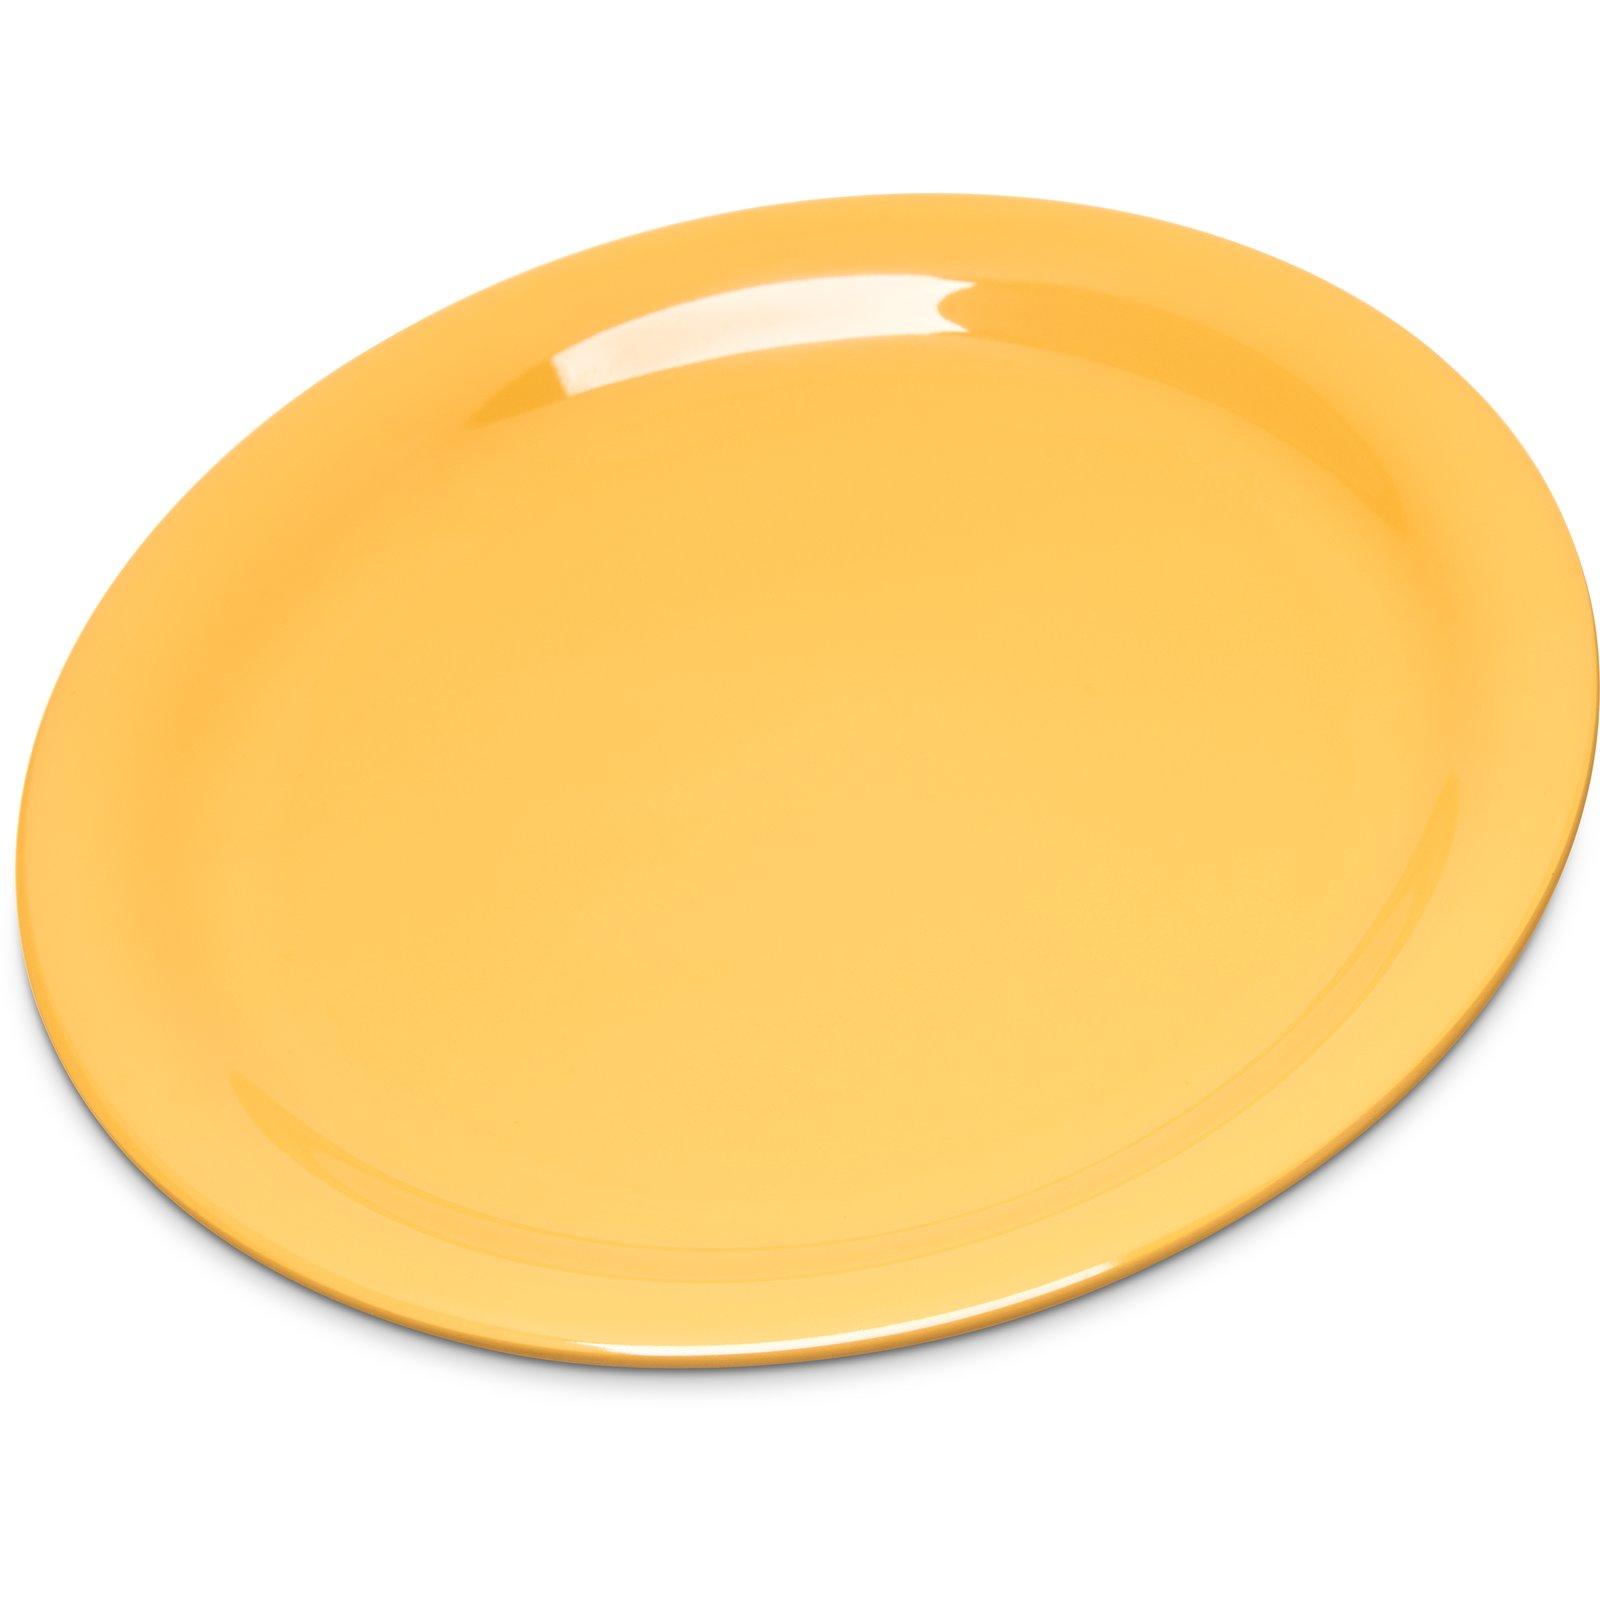 4300822 - Durus® Melamine Narrow Rim Pie Plate 6.5  - Honey Yellow  sc 1 st  Carlisle FoodService Products & 4300822 - Durus® Melamine Narrow Rim Pie Plate 6.5